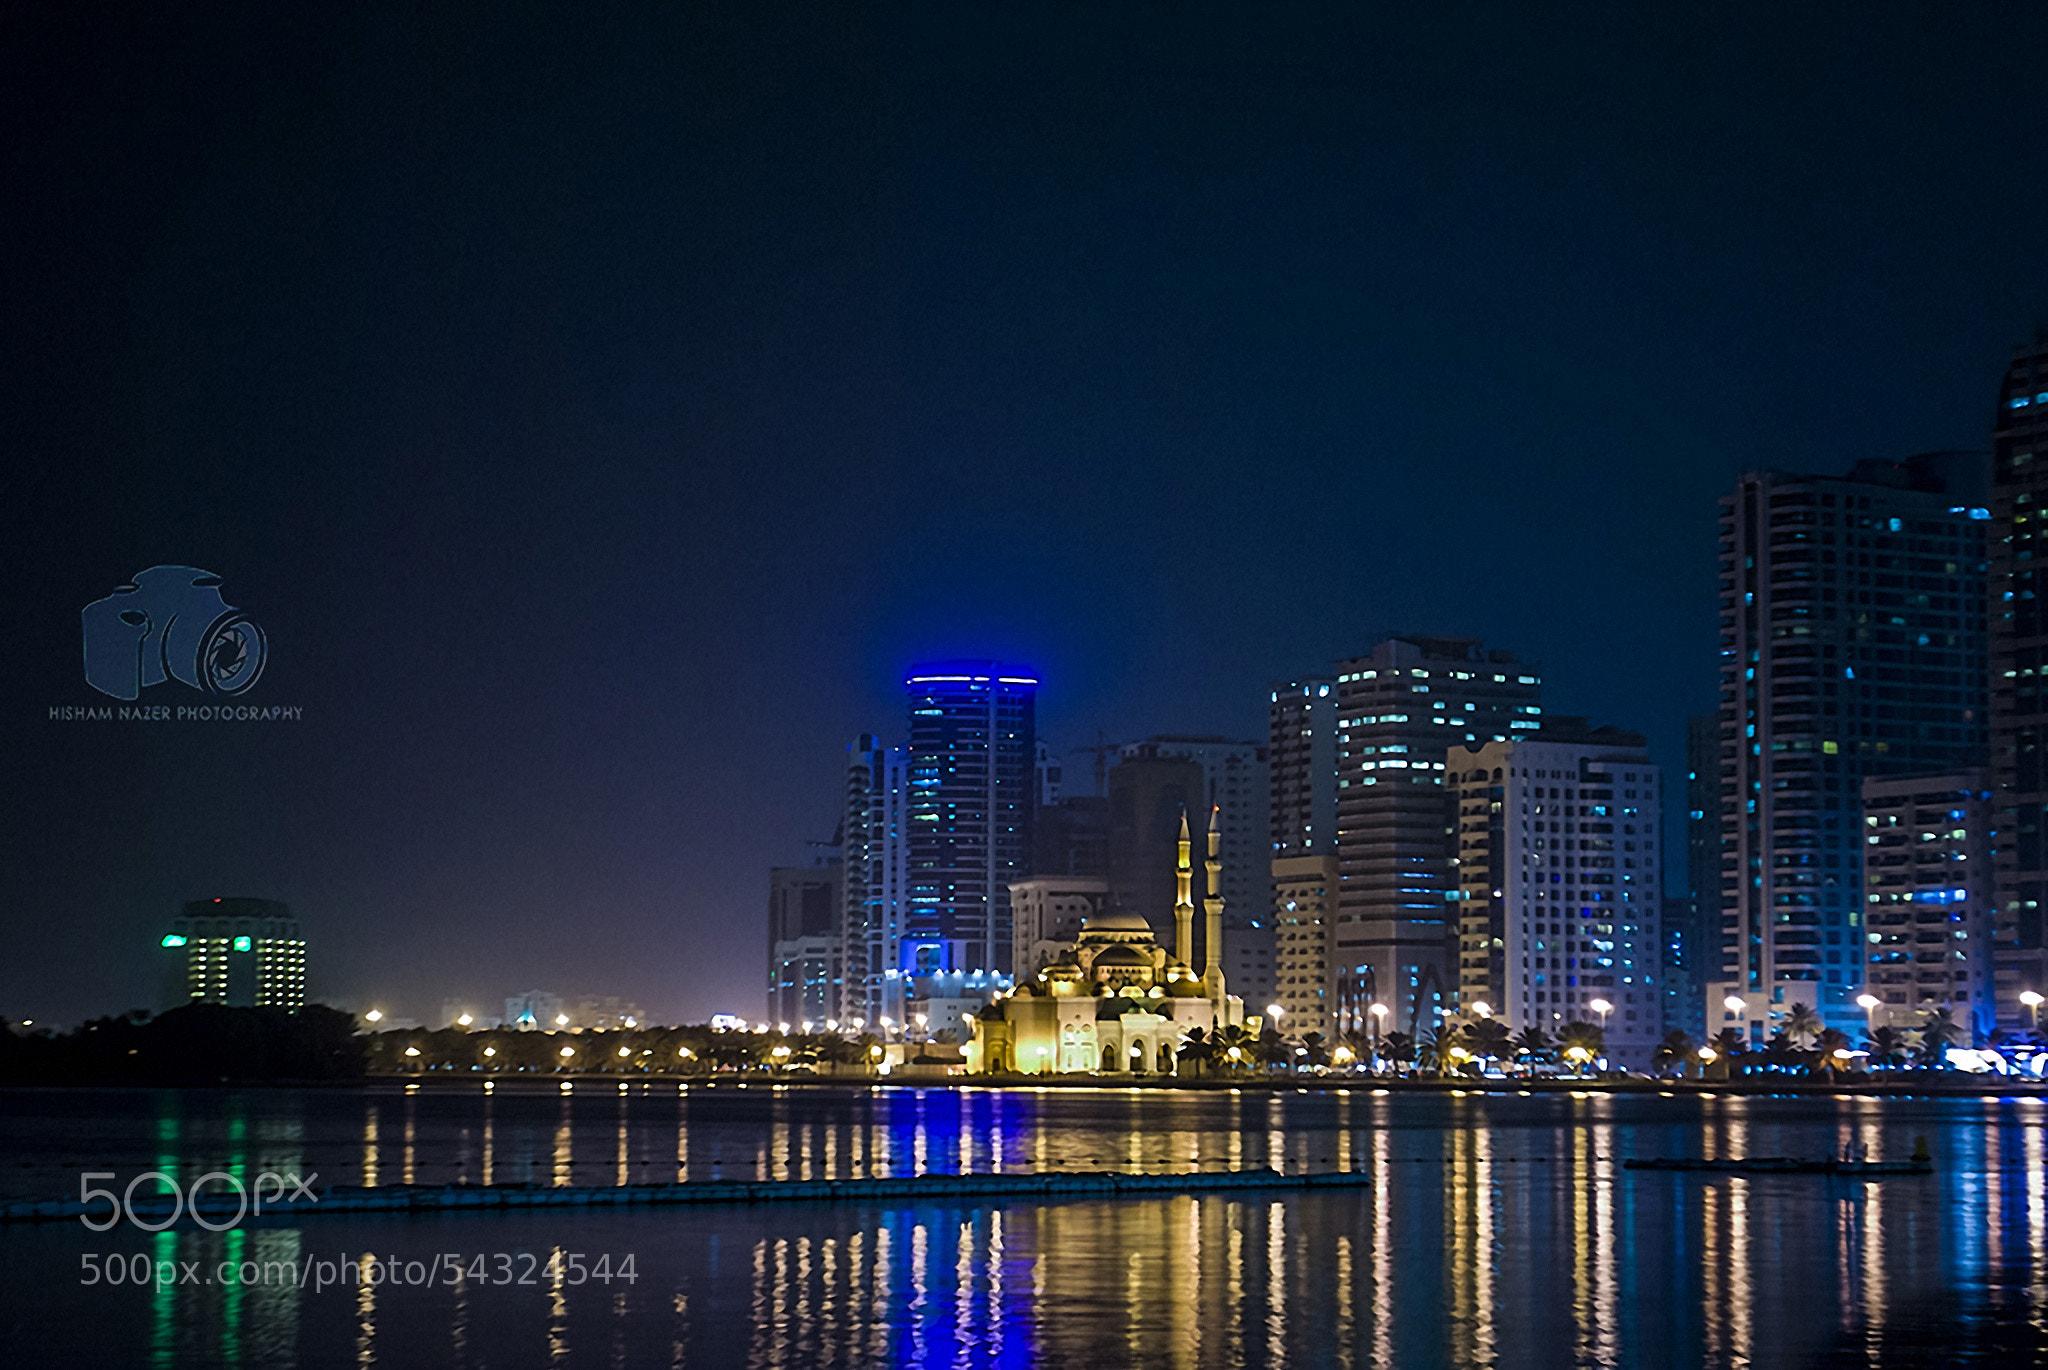 Photograph Golden City of Sharjah by Hisham Nazer on 500px